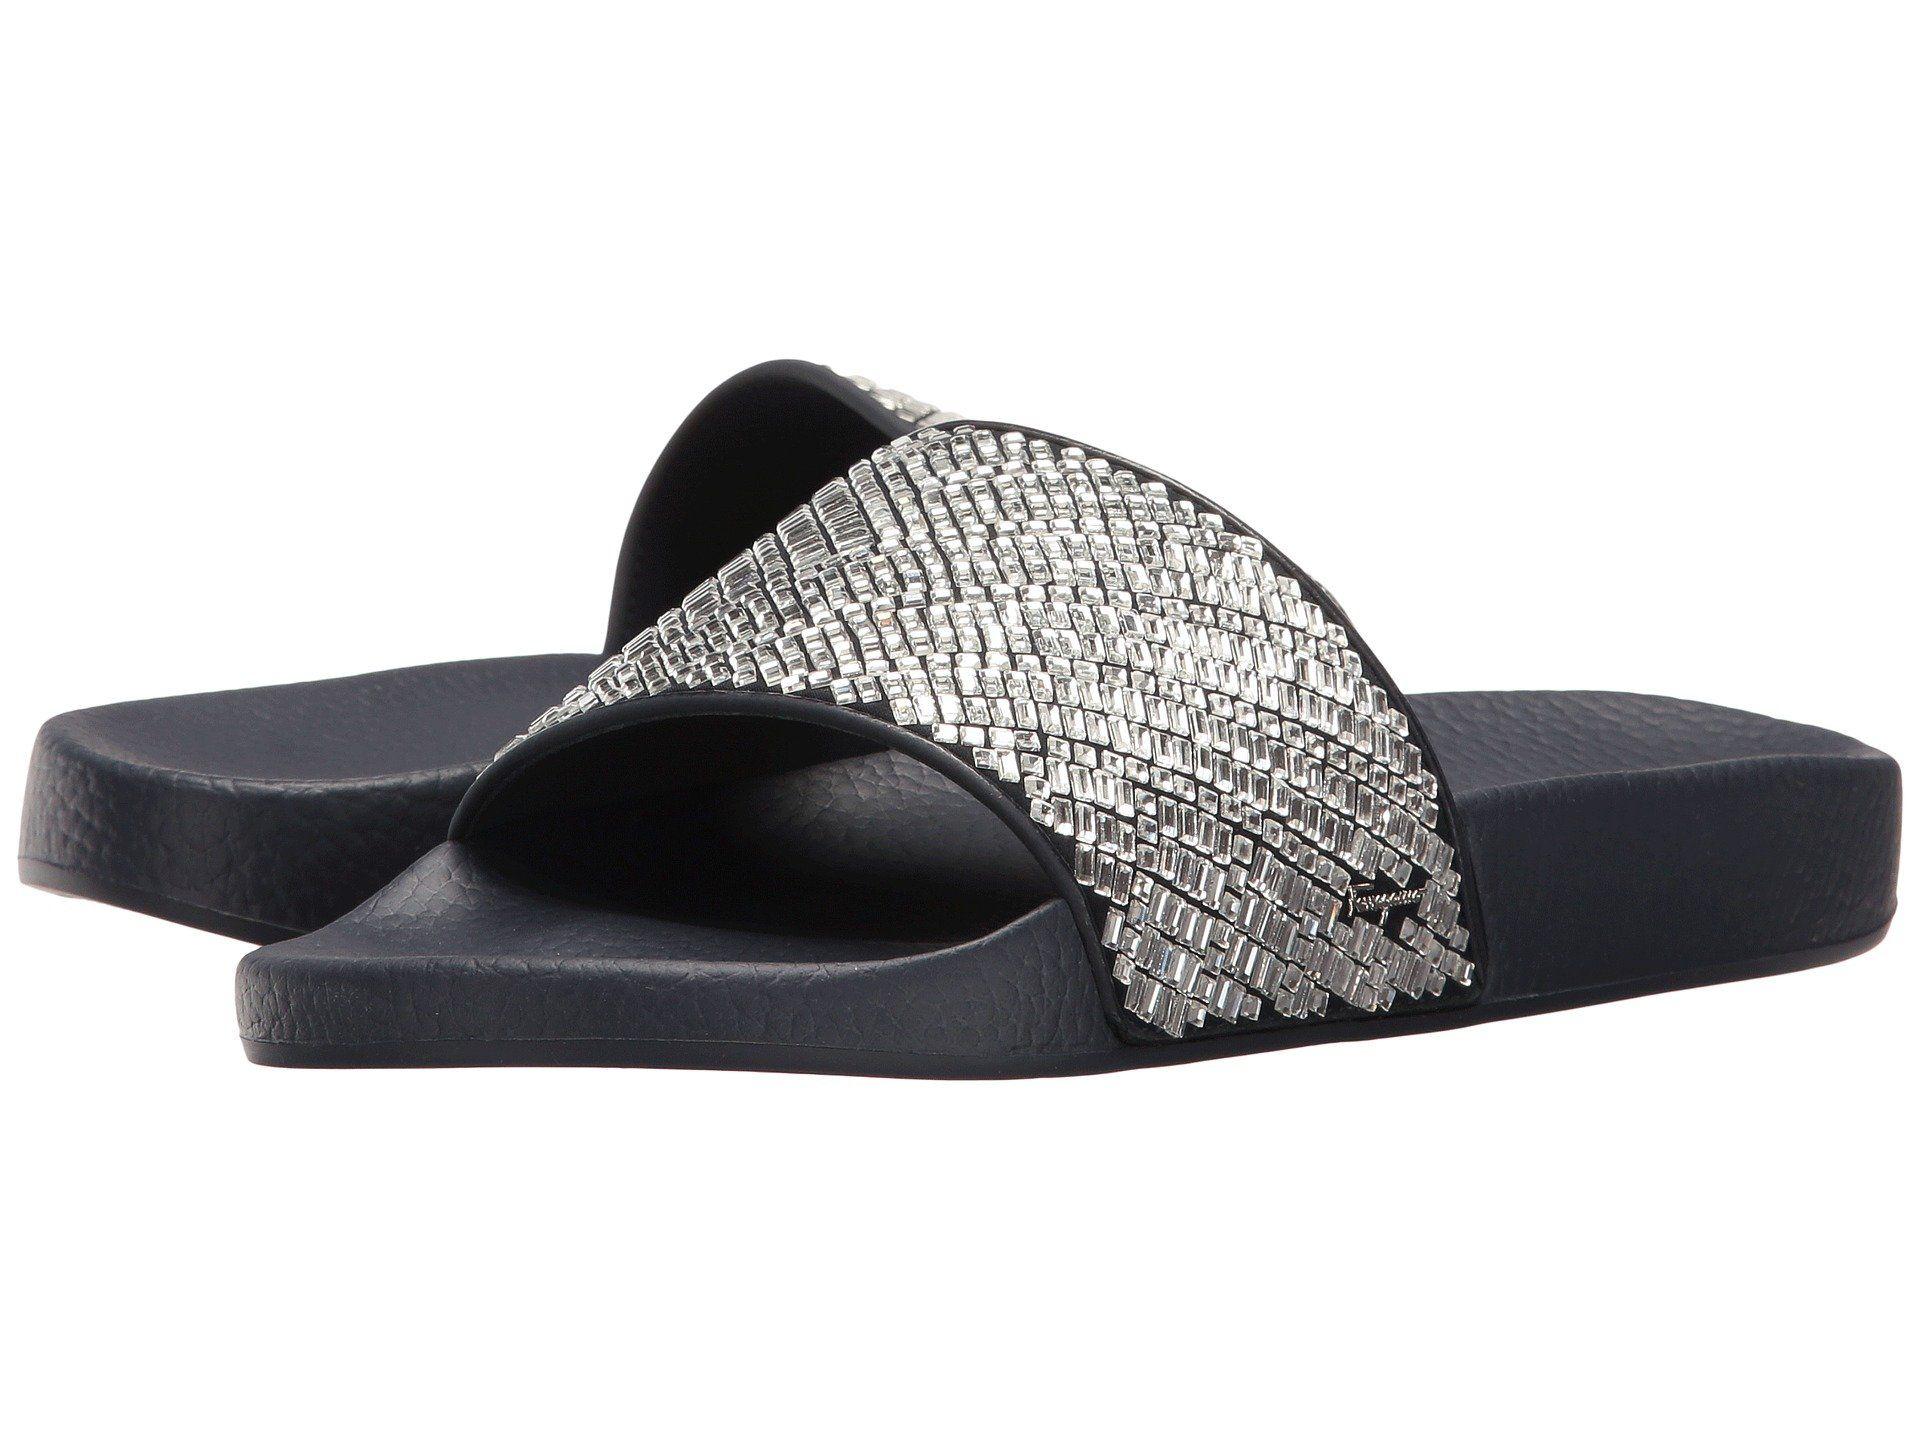 cbf9bd54f7b Salvatore ferragamo pool slide with crystals shoes jpg 1920x1440 Ferragamo  womens pool sandals